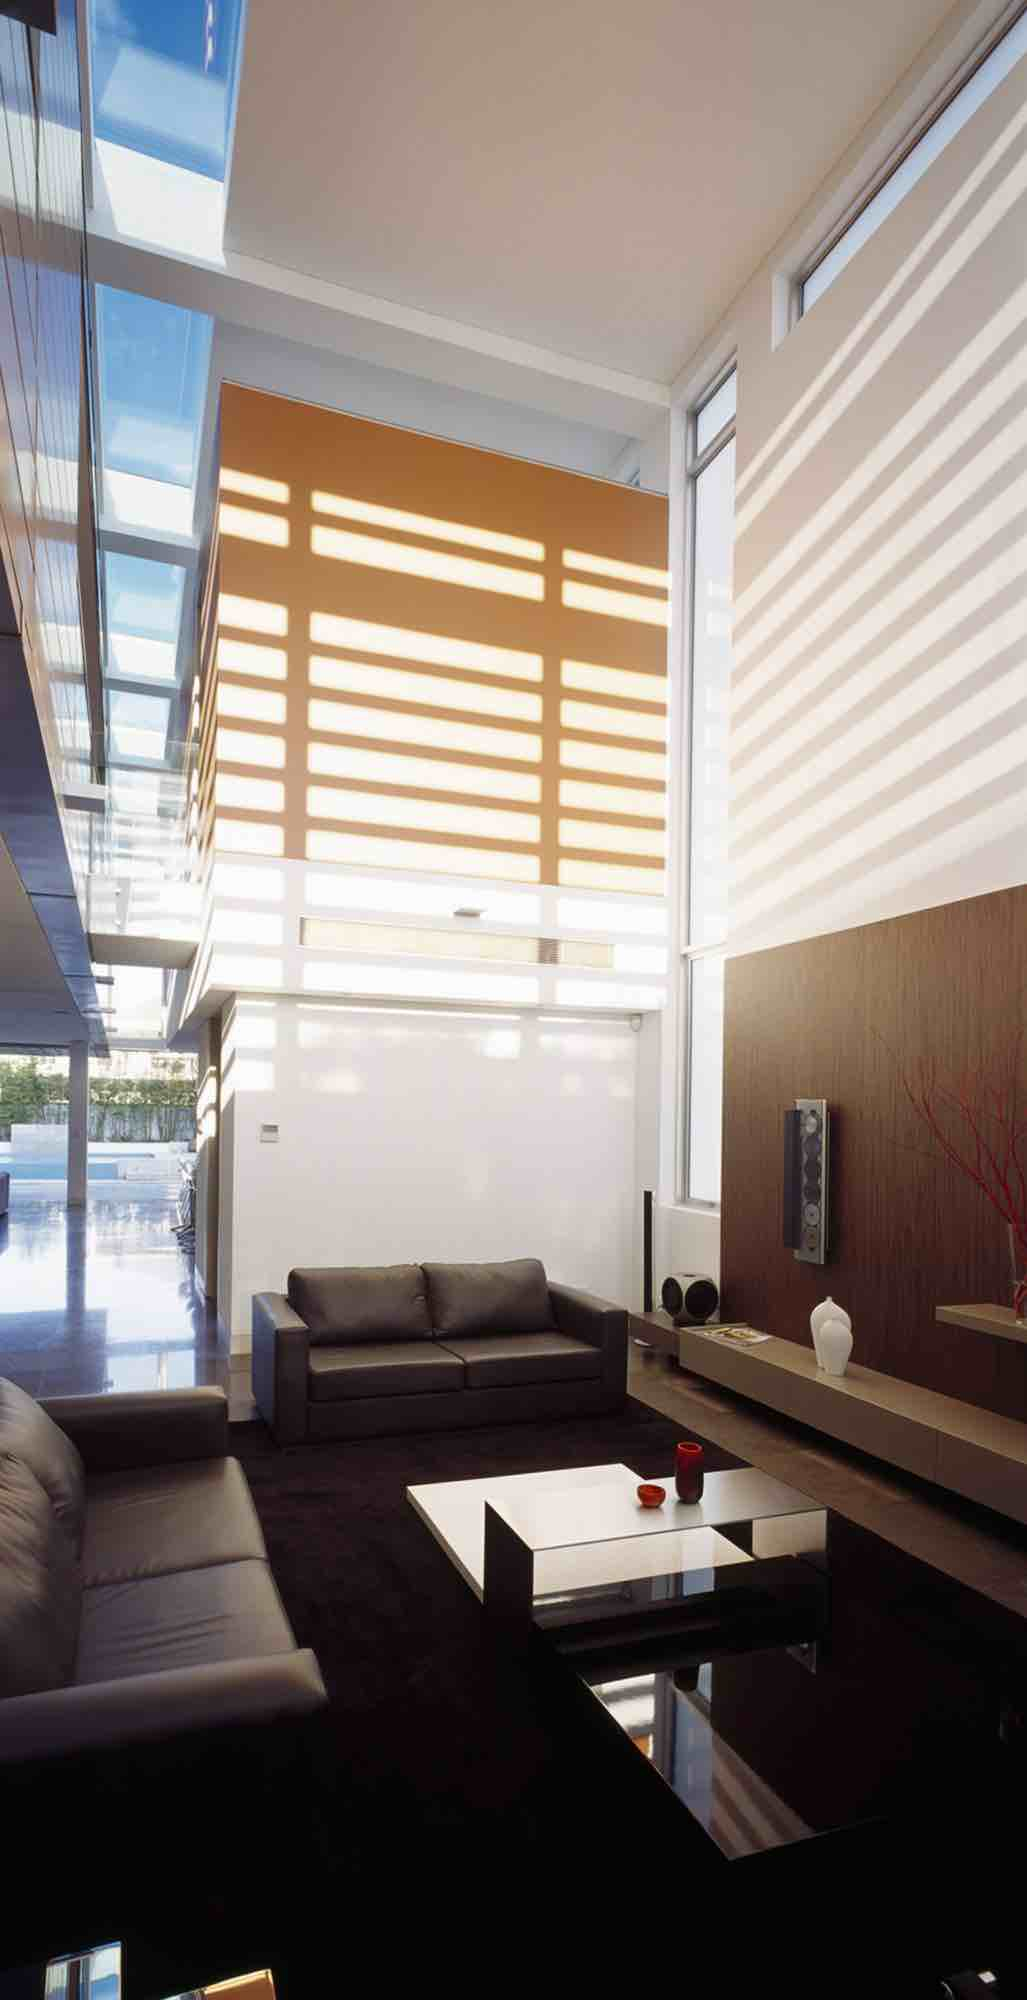 minosa-design-high-voids-sitting-room-modern-custom-joinery-gas-fireplace-limestone-floor-02